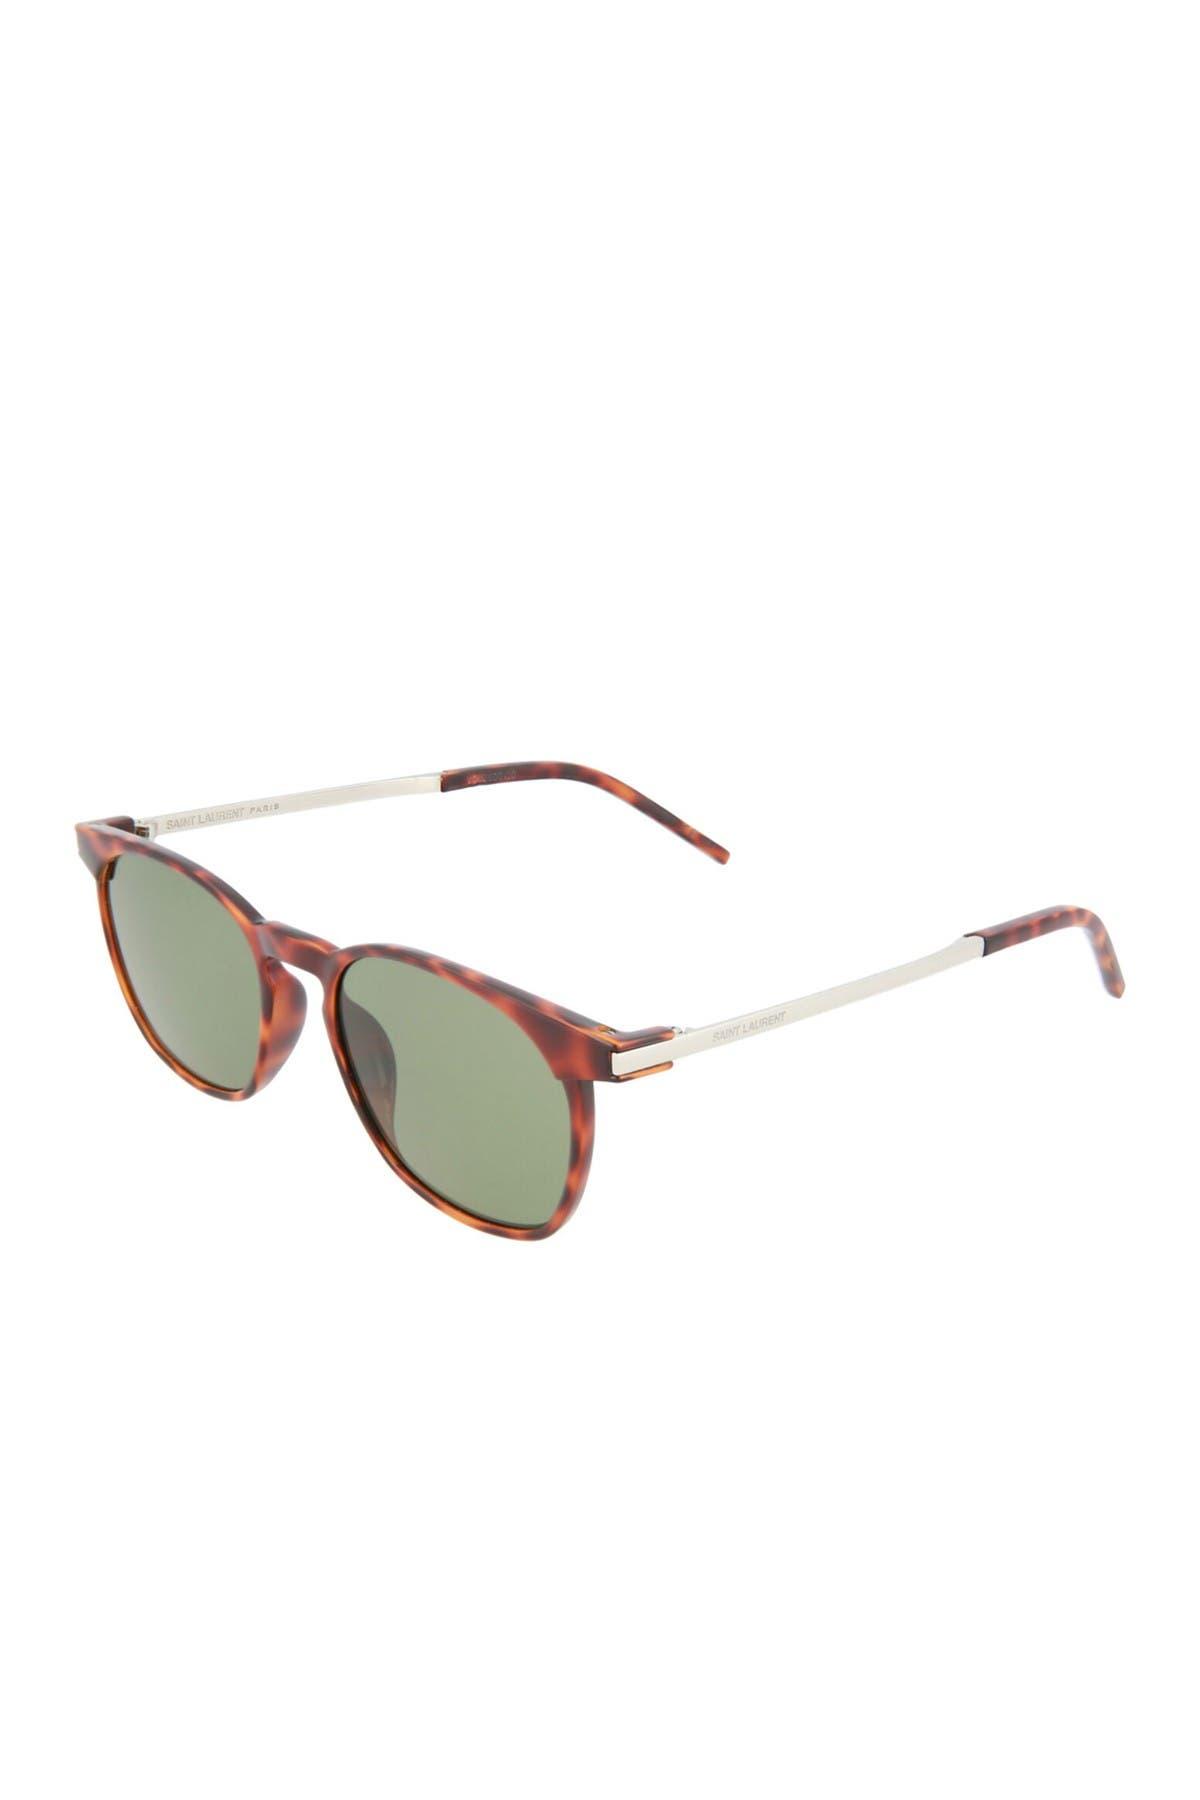 Image of Saint Laurent 51mm Square Sunglasses